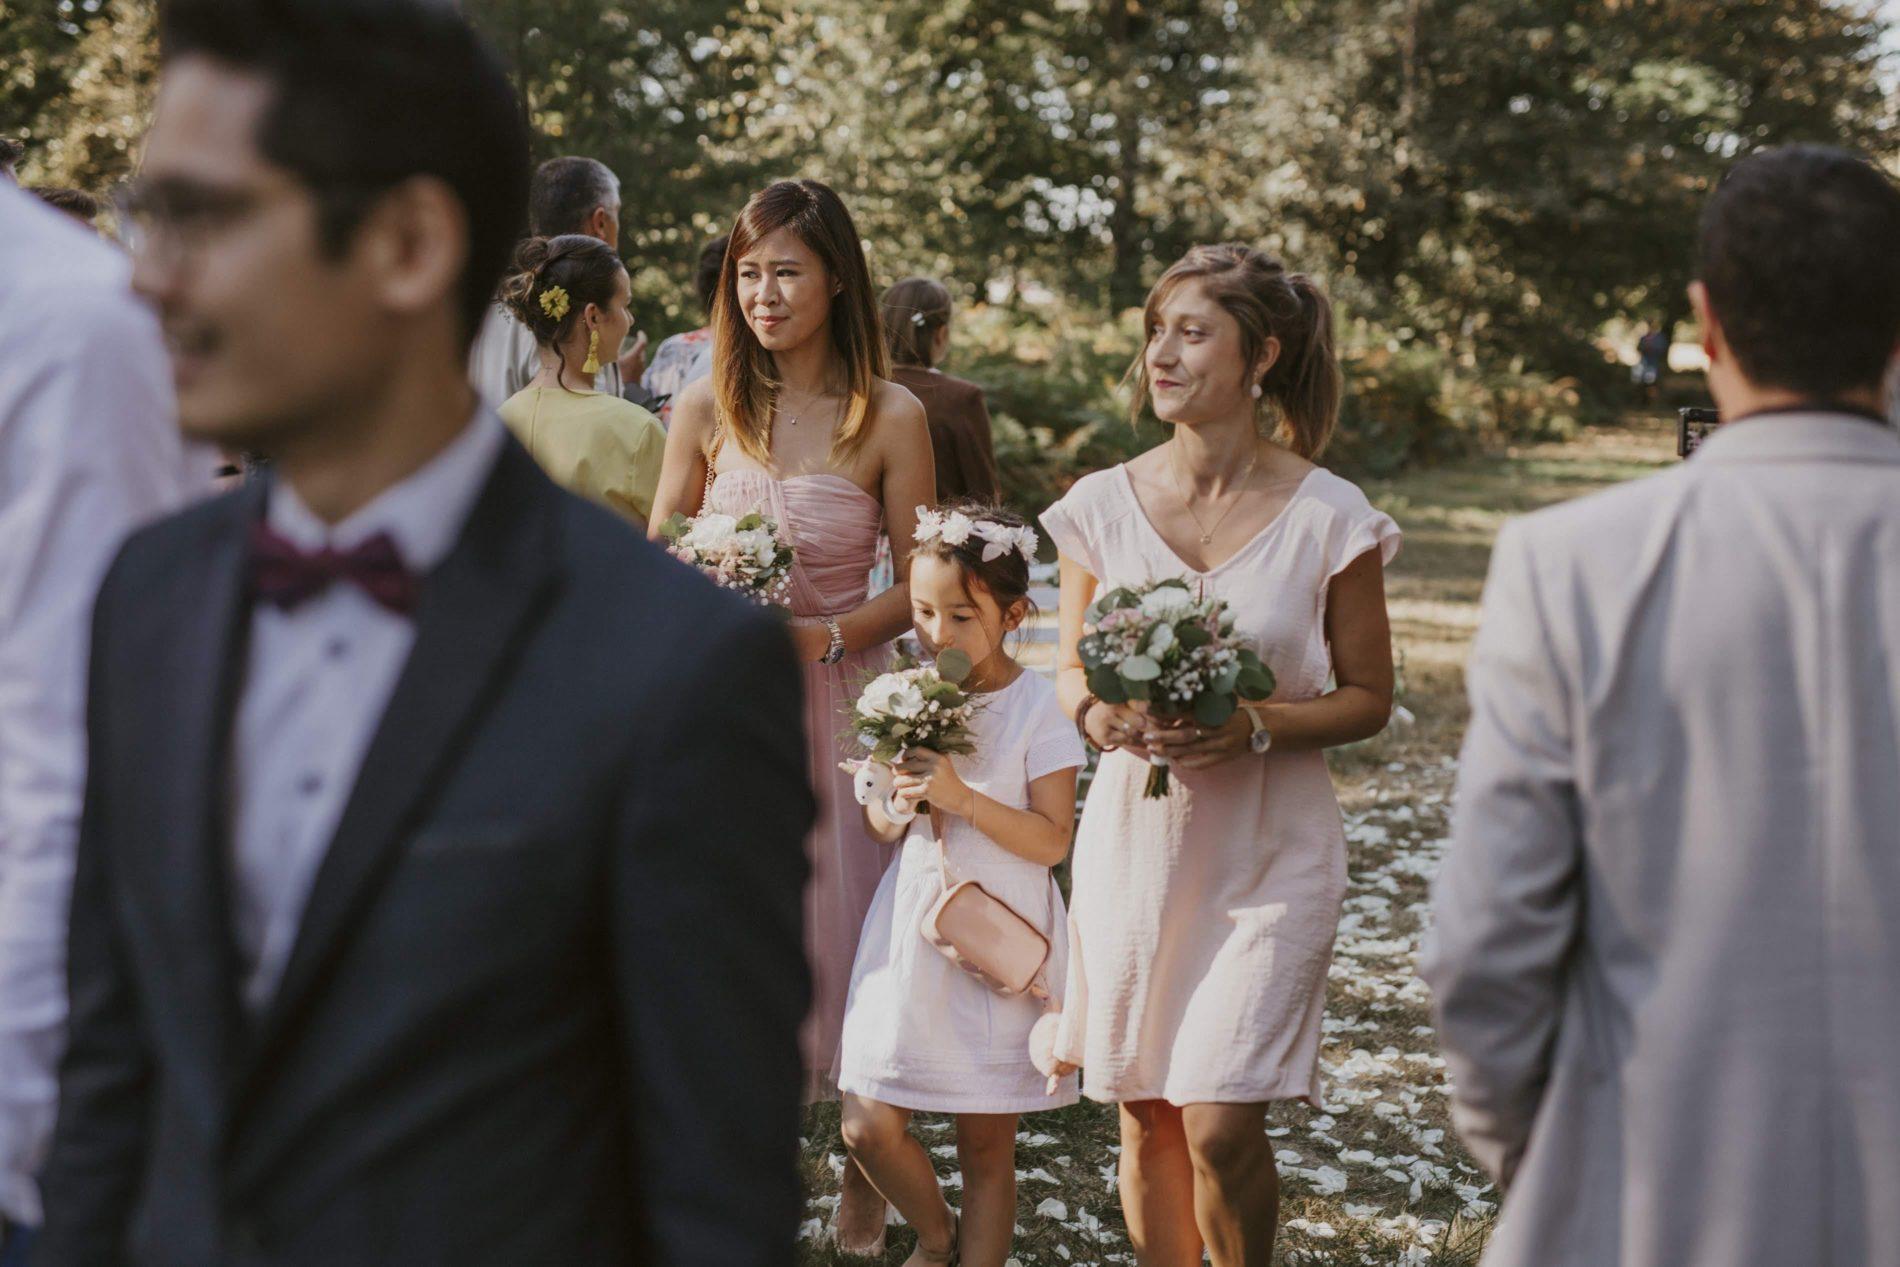 03-CelineSereivuth-116-obonheurdesdames-decoration-mariage-location-Jordane-Chaillou